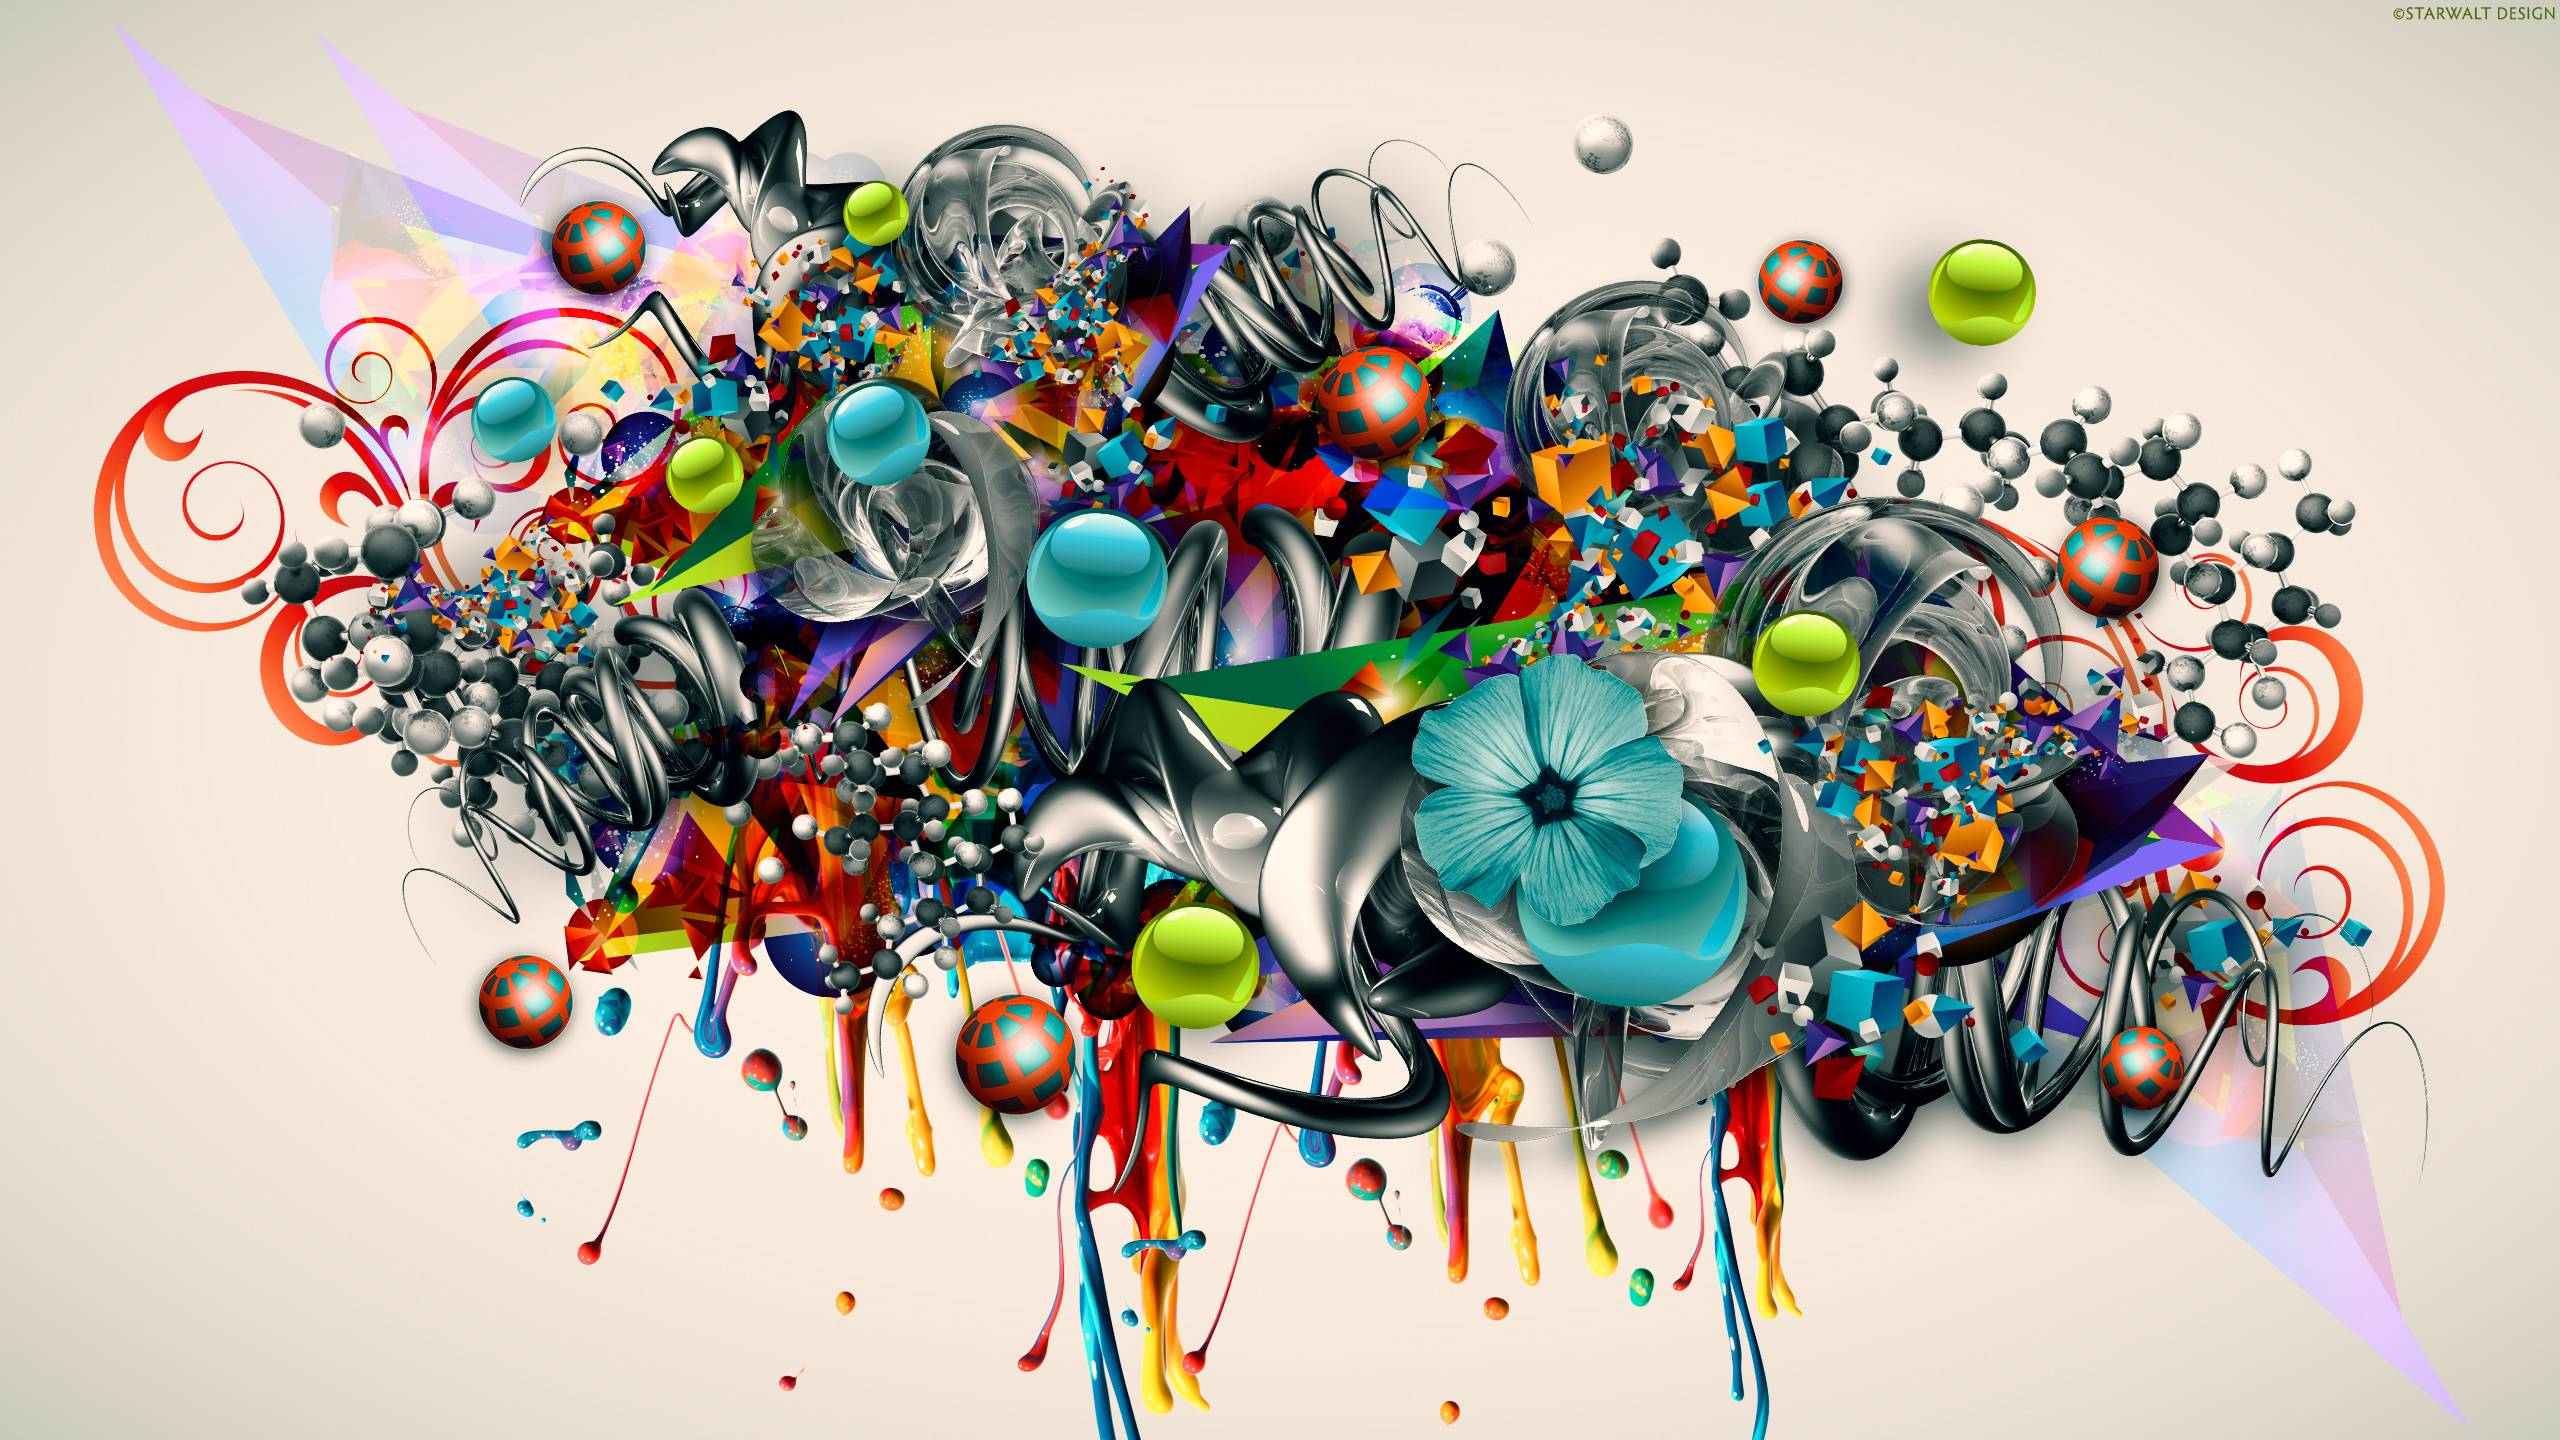 Download graffiti creator java - Graffiti Creator Backgrounds Graffiti Desktop Wallpaper Download Graffiti Wallpaper In Hd